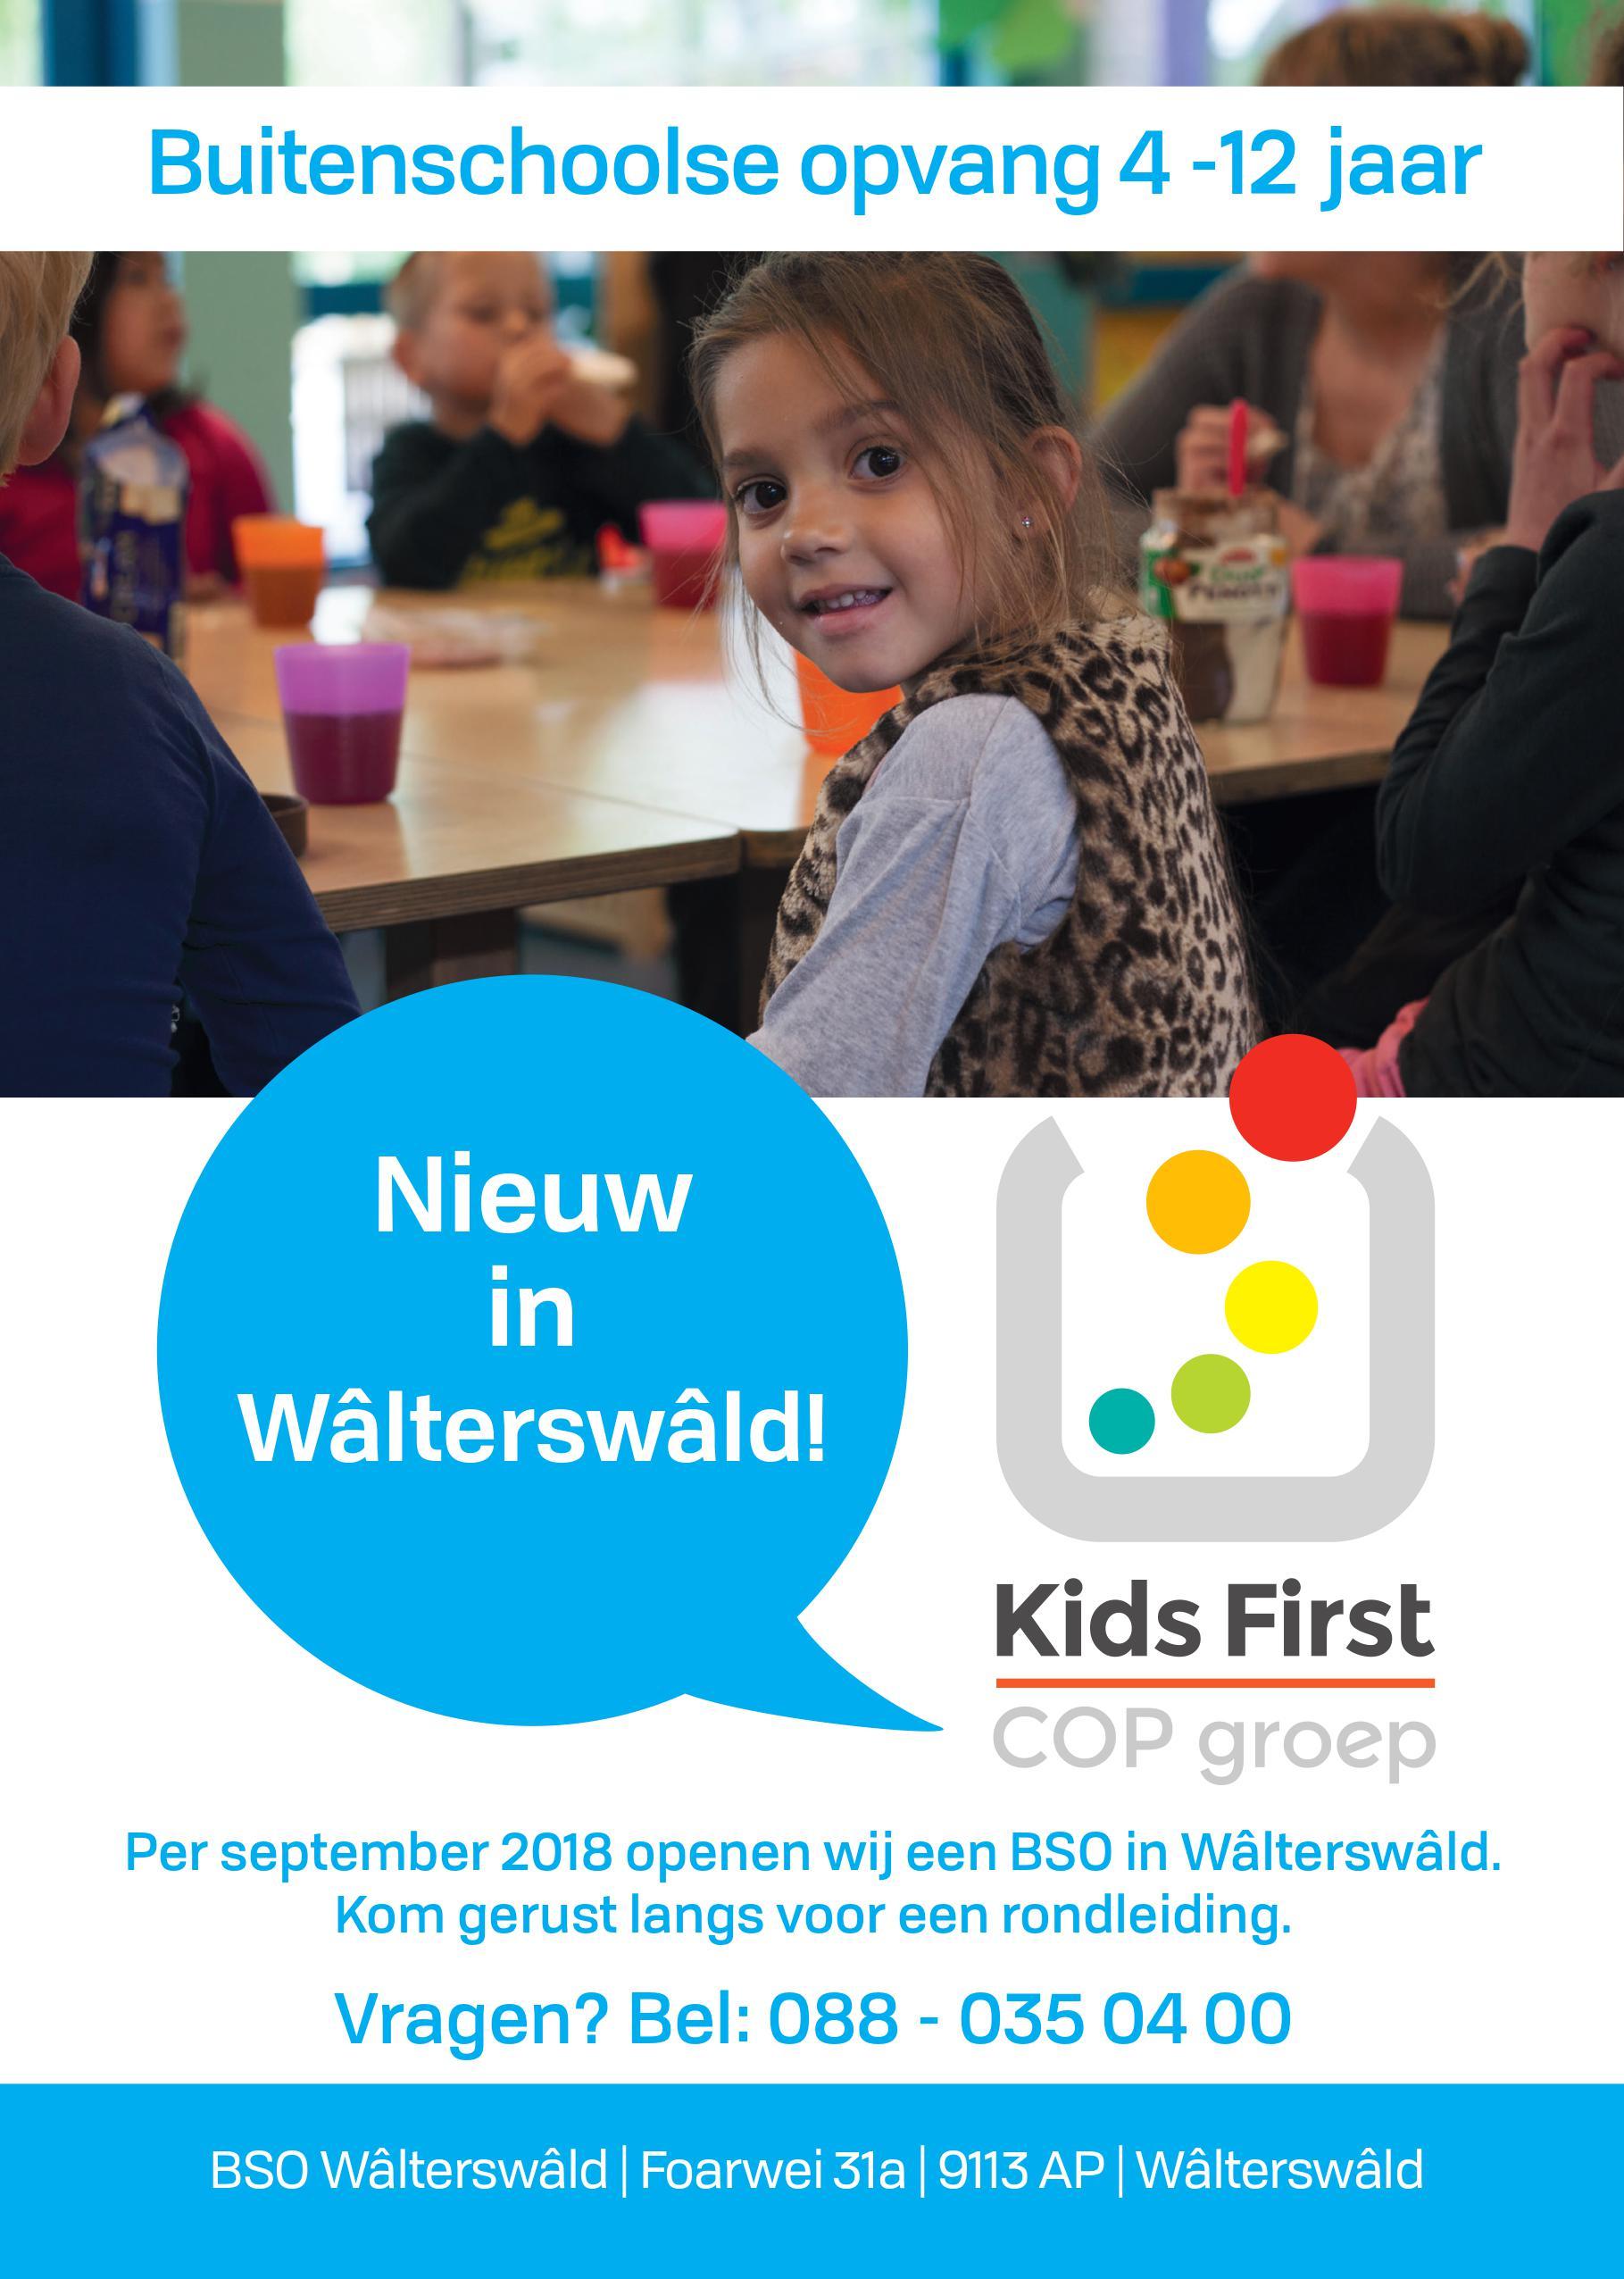 BSO Wâlterswâld - Kids First COP groep